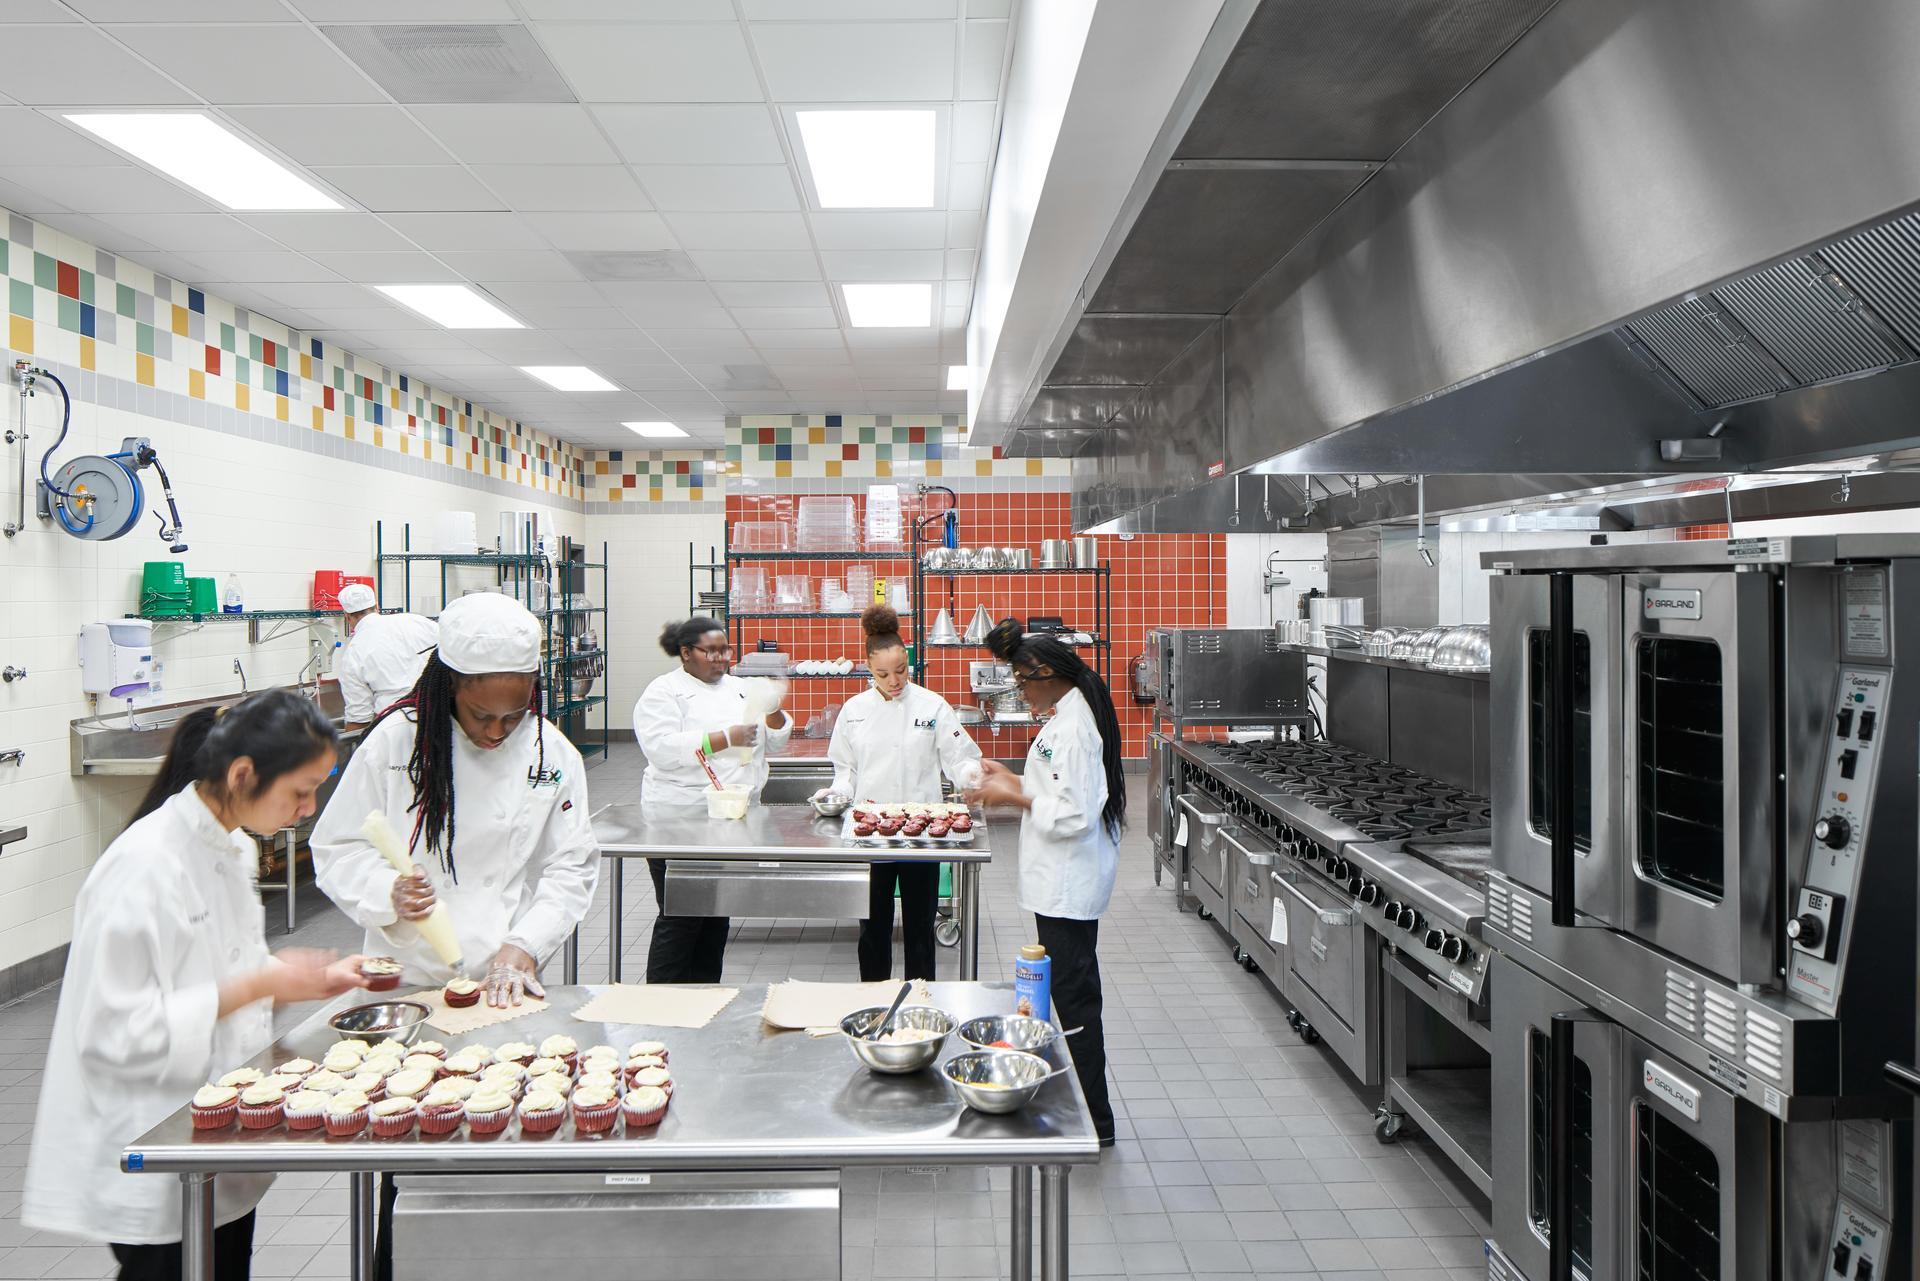 Lexington 2 Innovation Center Culinary Arts Center Kitchen